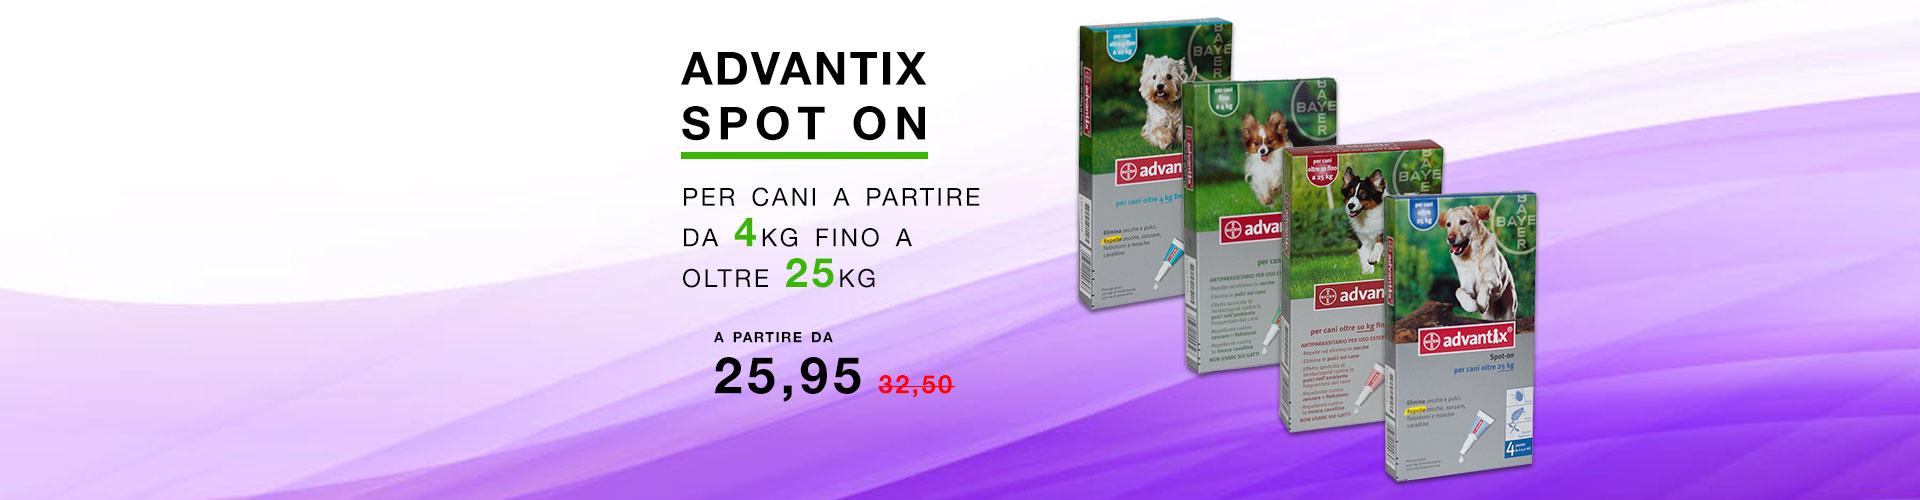 advantix-miglior-prezzo-online-parafarmacia-farmaetnea